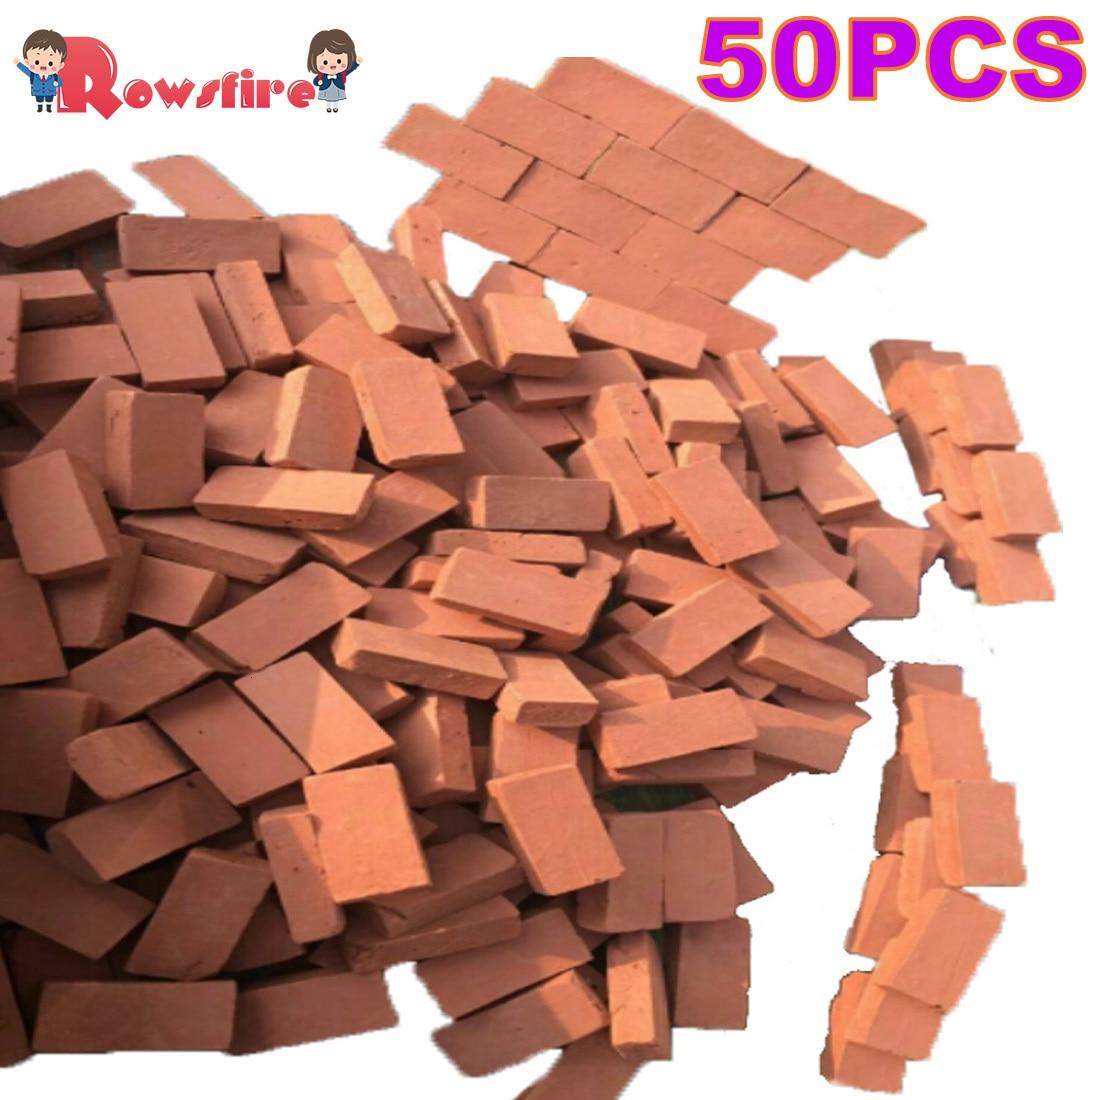 166Pcs 1:16 Scale Mini Red Bricks Model Antique Micro Landscape Decorative Bricks For DIY Sand Table Building - Orange Red